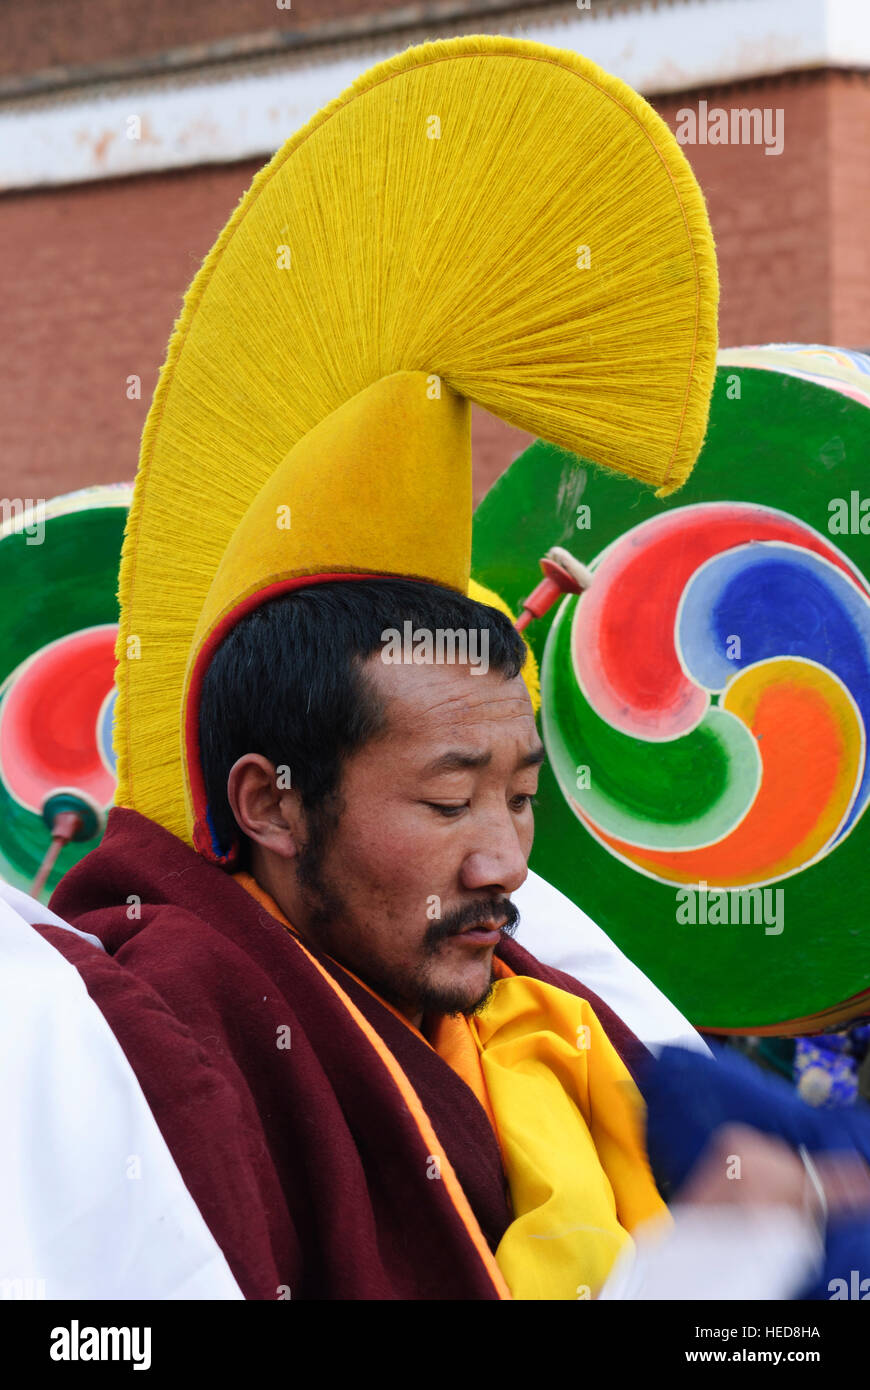 Xiahe sombrero amarillo: monje tibetano, monasterio de Labrang en el Festival Monlam,; cham (danza); Excile masquerade Imagen De Stock